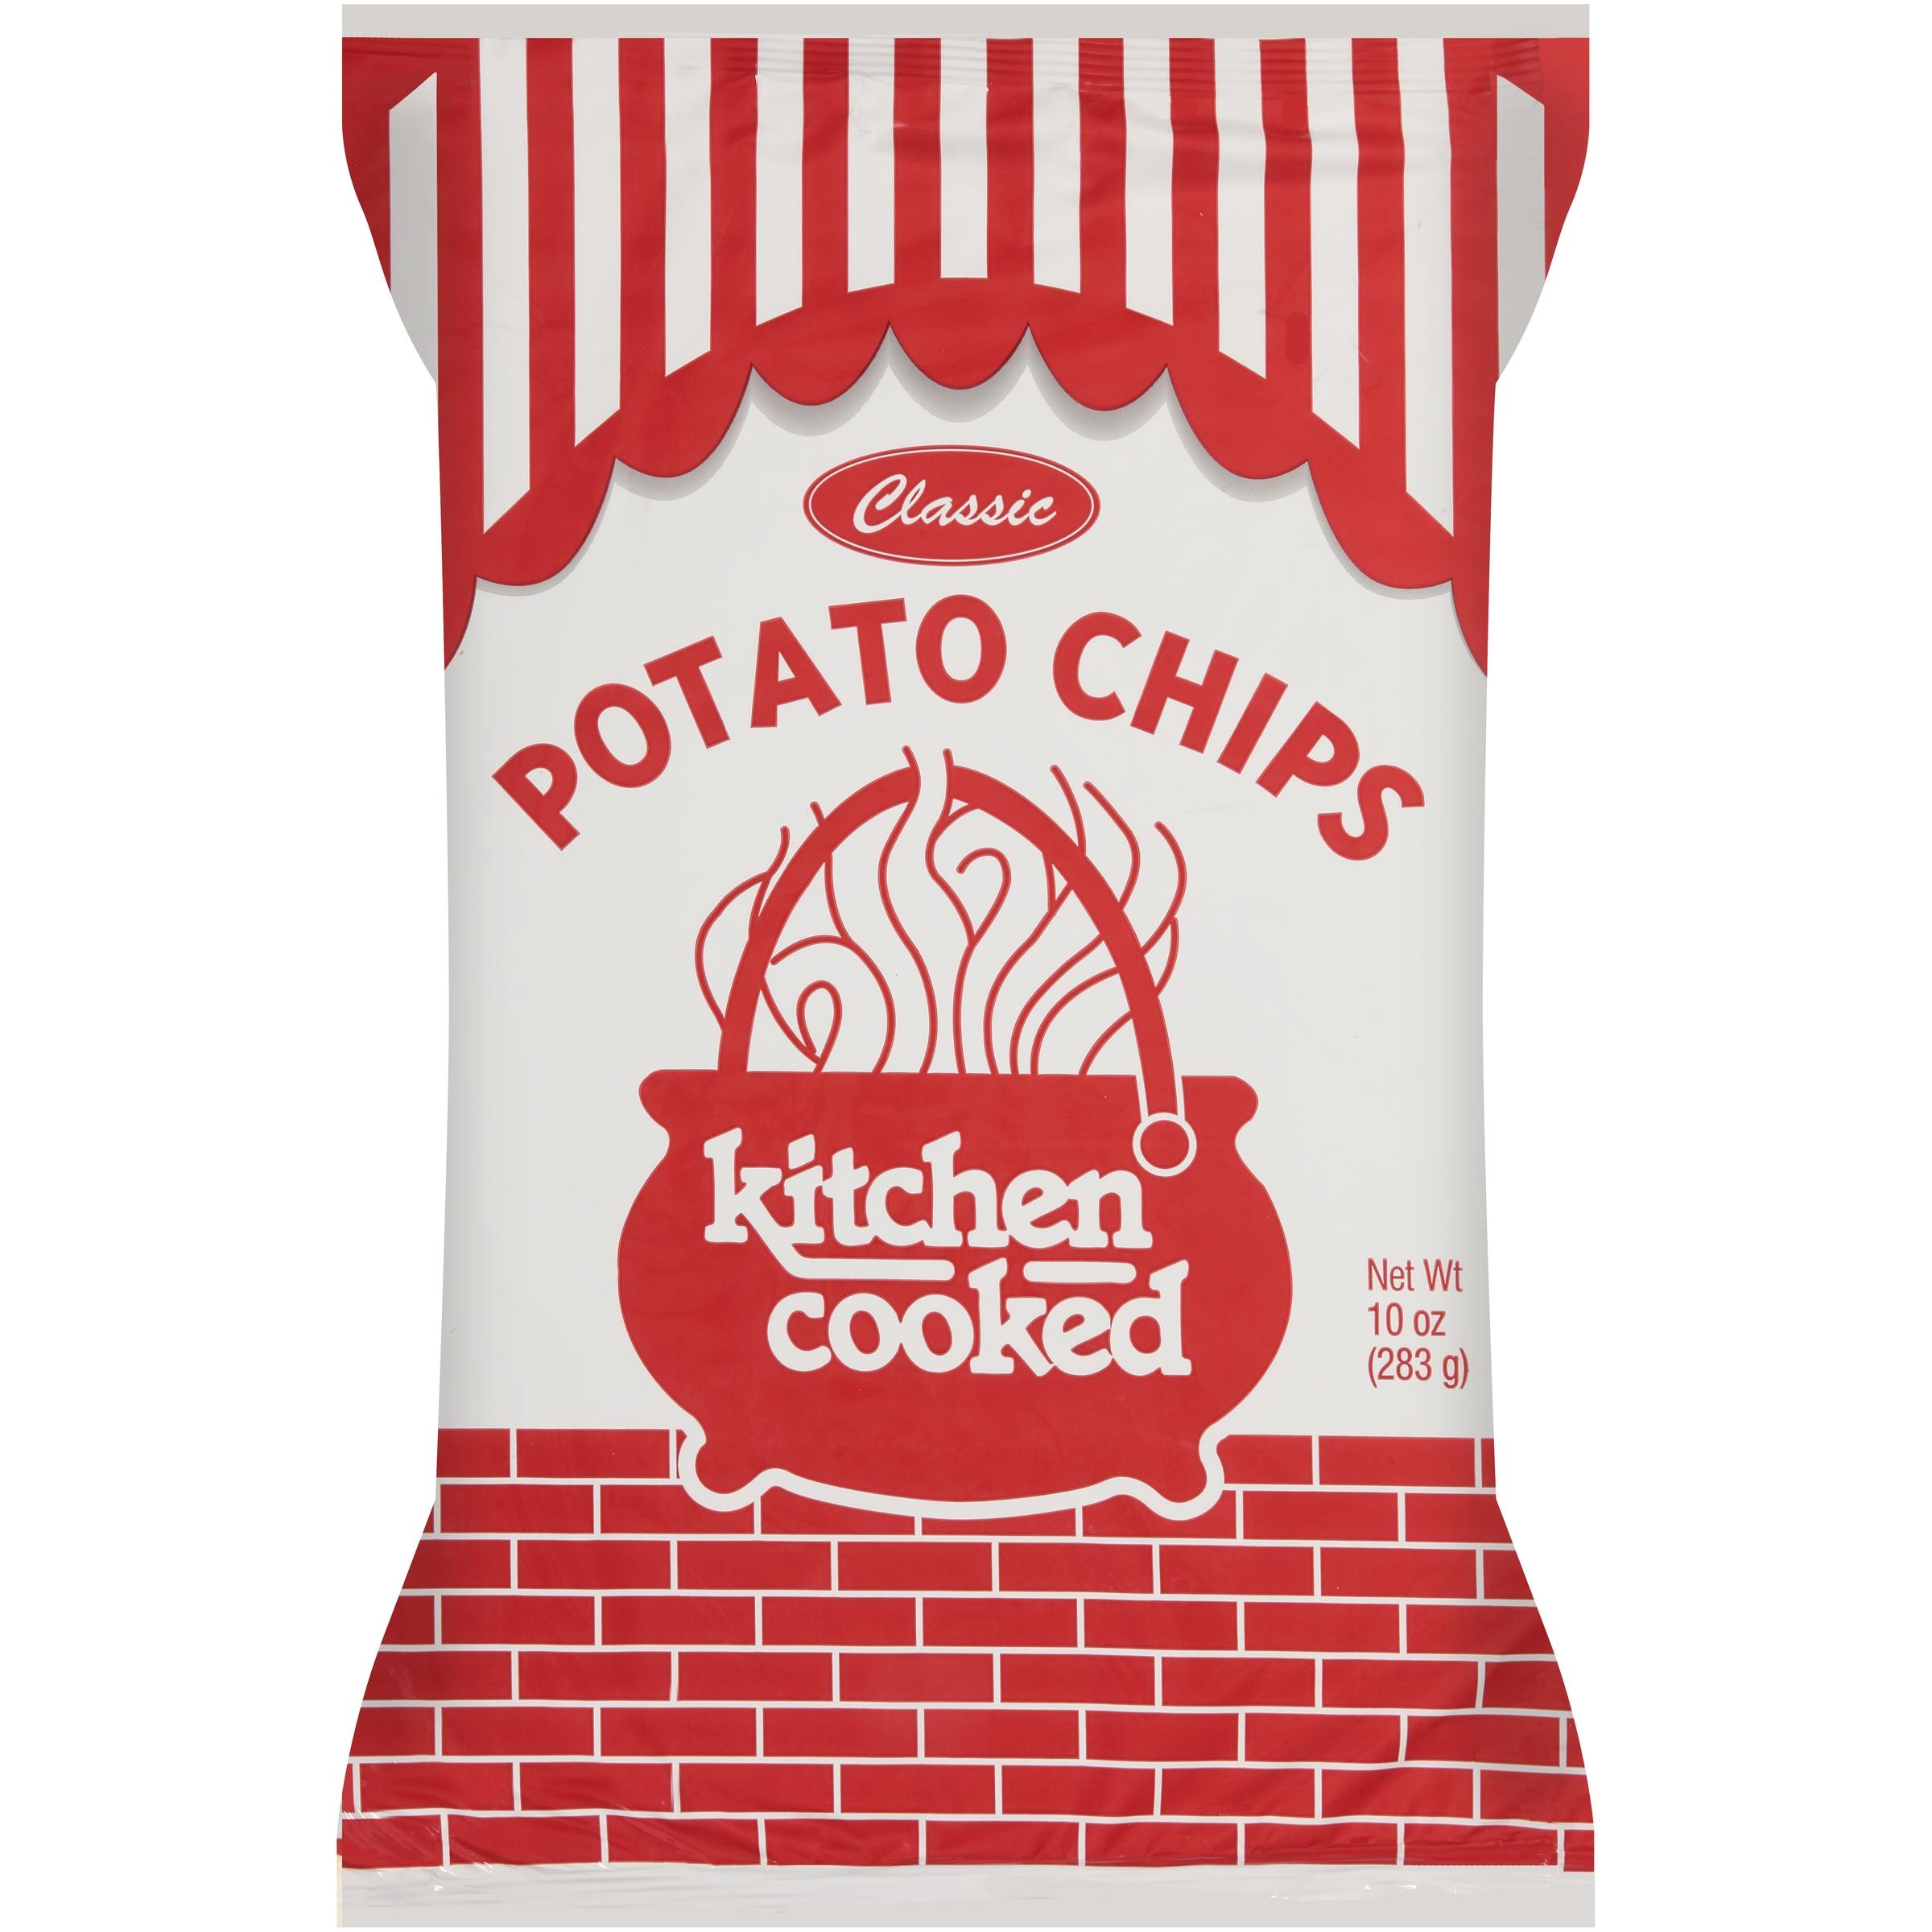 Kitchen Cooked Classic Potato Chips, 10 Oz.